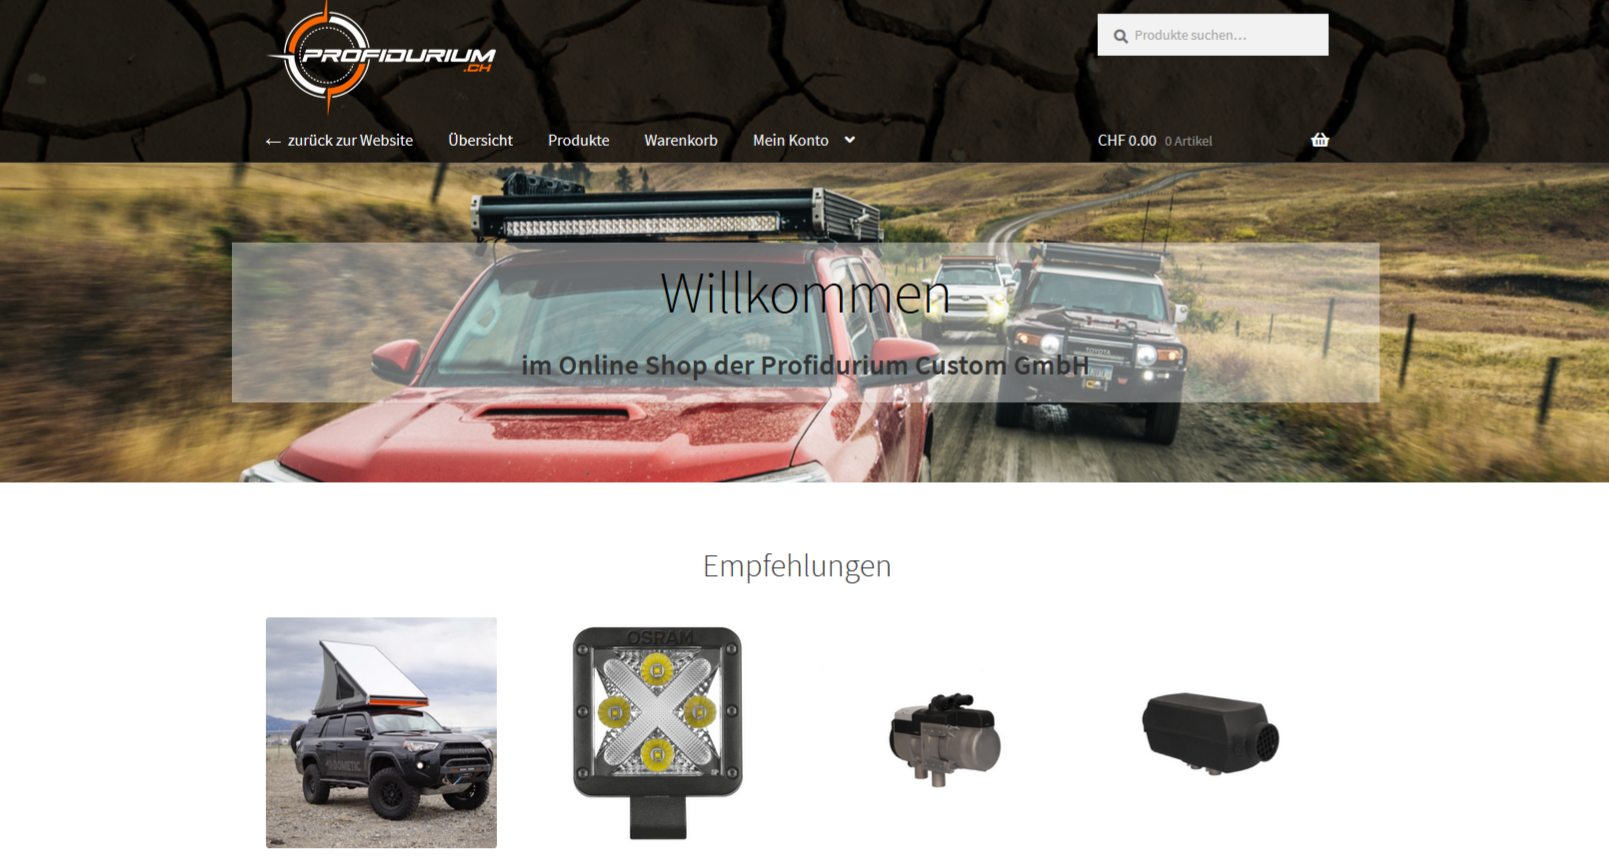 Profidurium Webshop, Offorad Ausrüstung